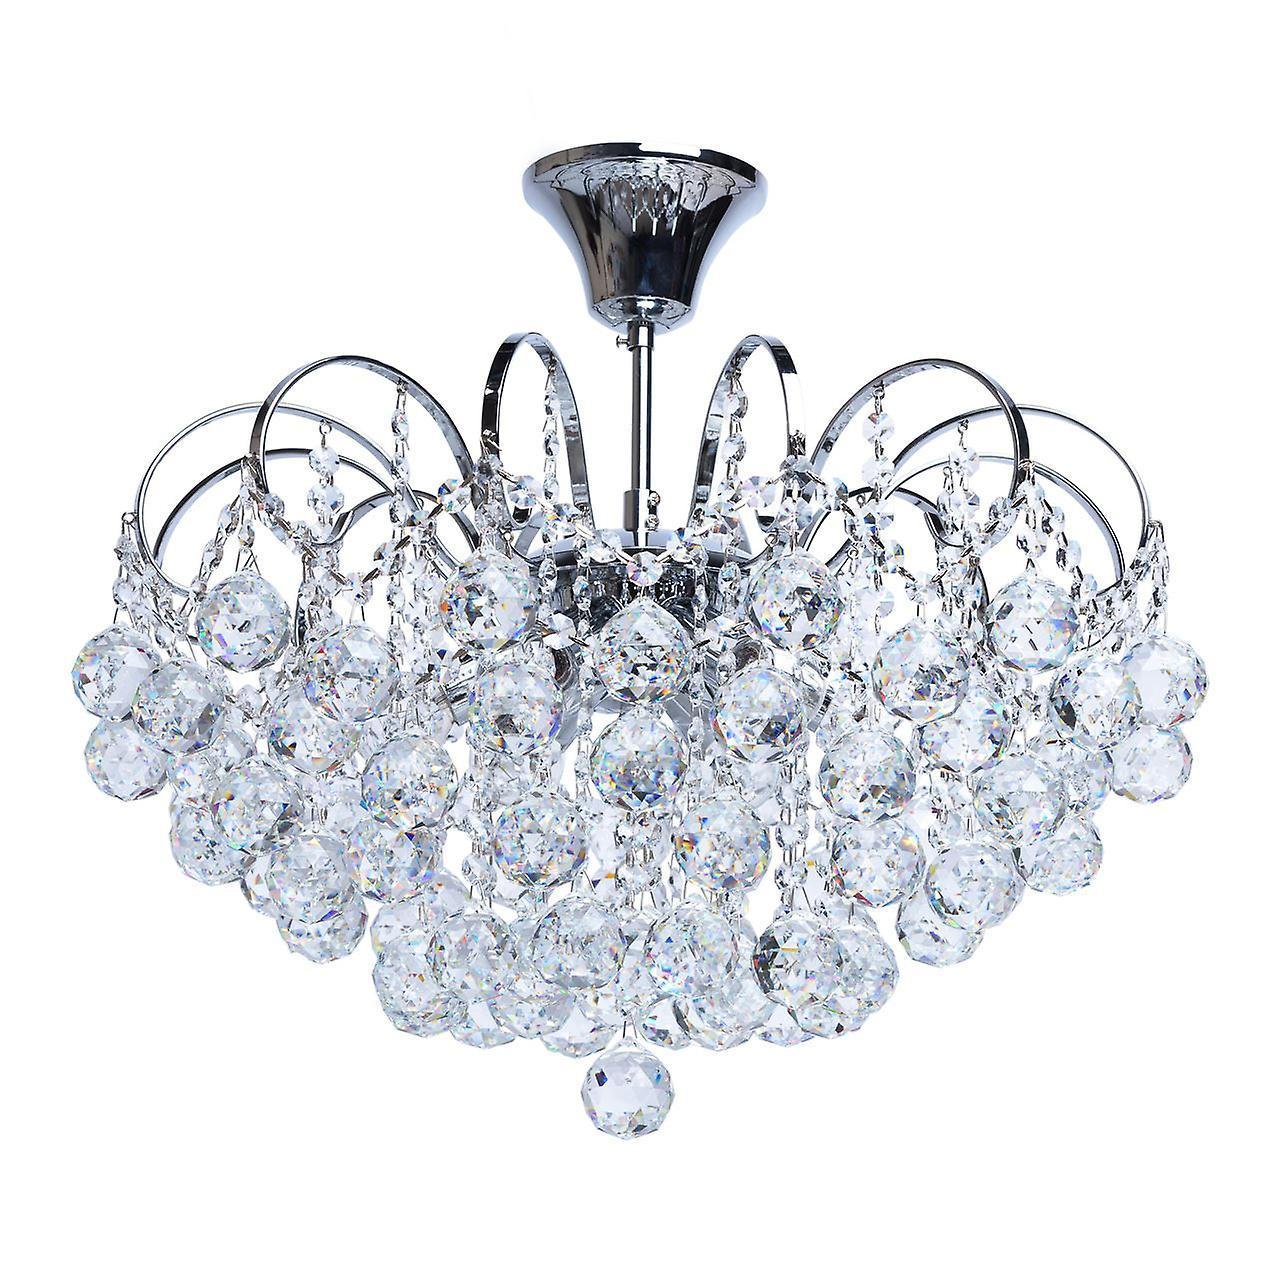 Glasberg - Chrome Finish Six lumière Semi-Flush Fitting With crystals 232017506